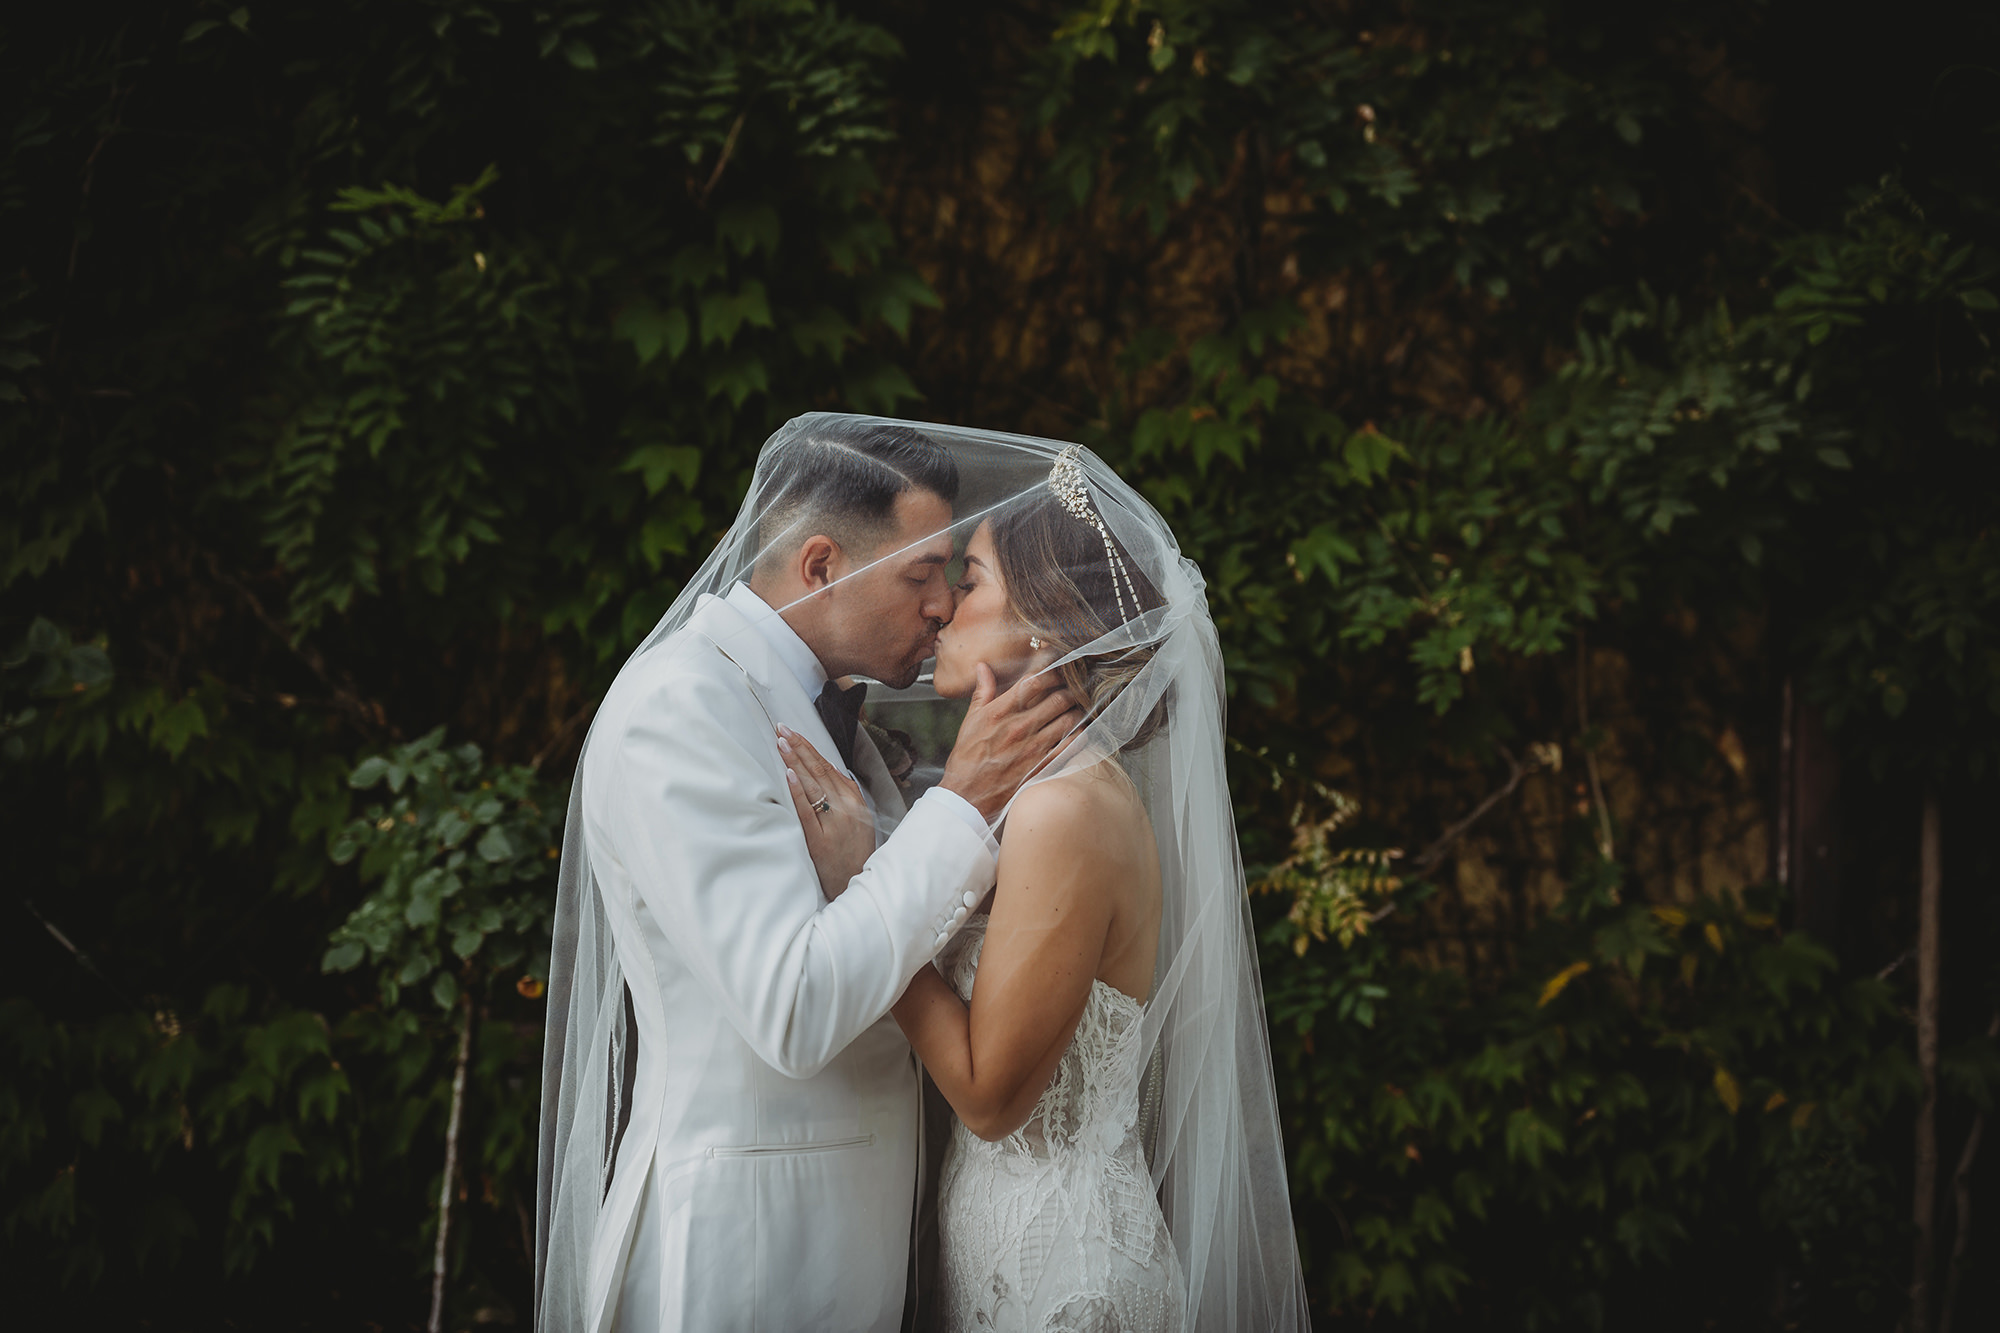 Bride and groom kiss under veil at the Harvest Inn Vineyard in St Helena